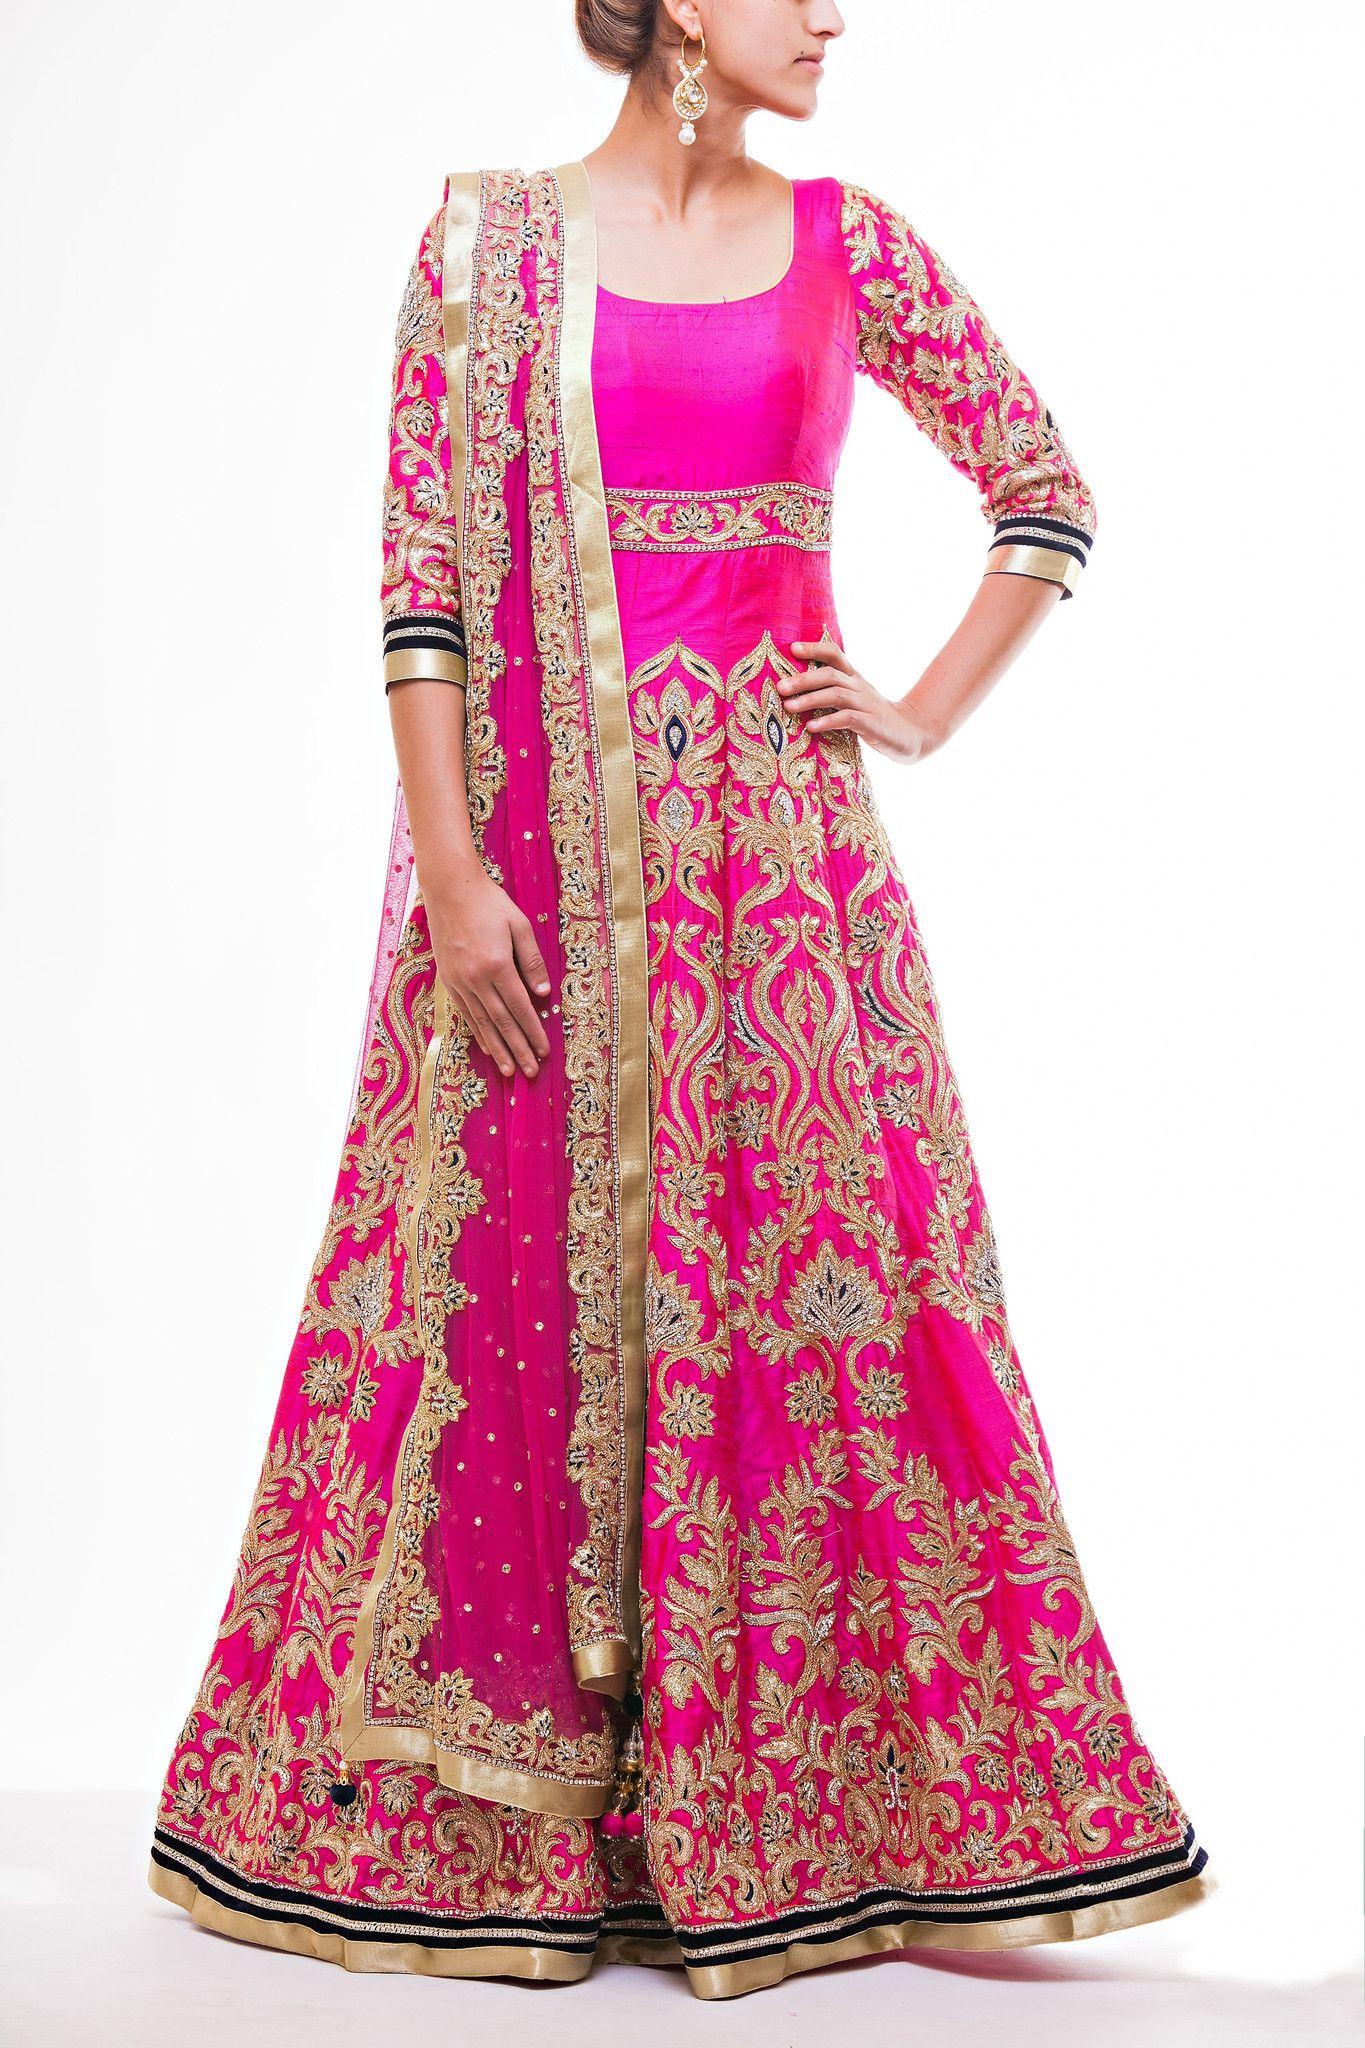 Pin de Navu en Indian wedding | Pinterest | Vestiditos